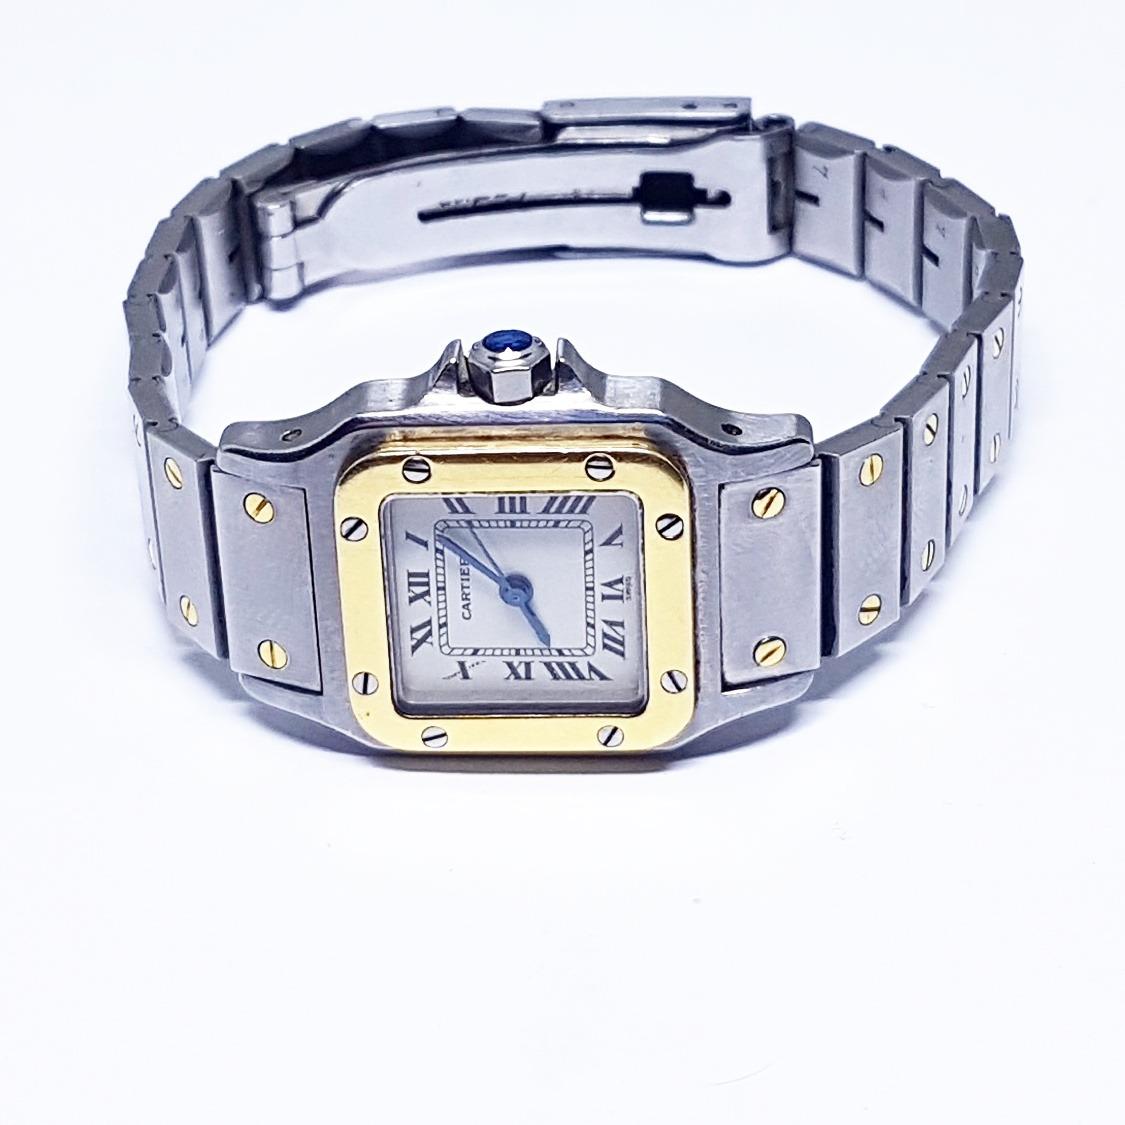 4008c7c3bbf relógio cartier feminino santos automático. Carregando zoom.